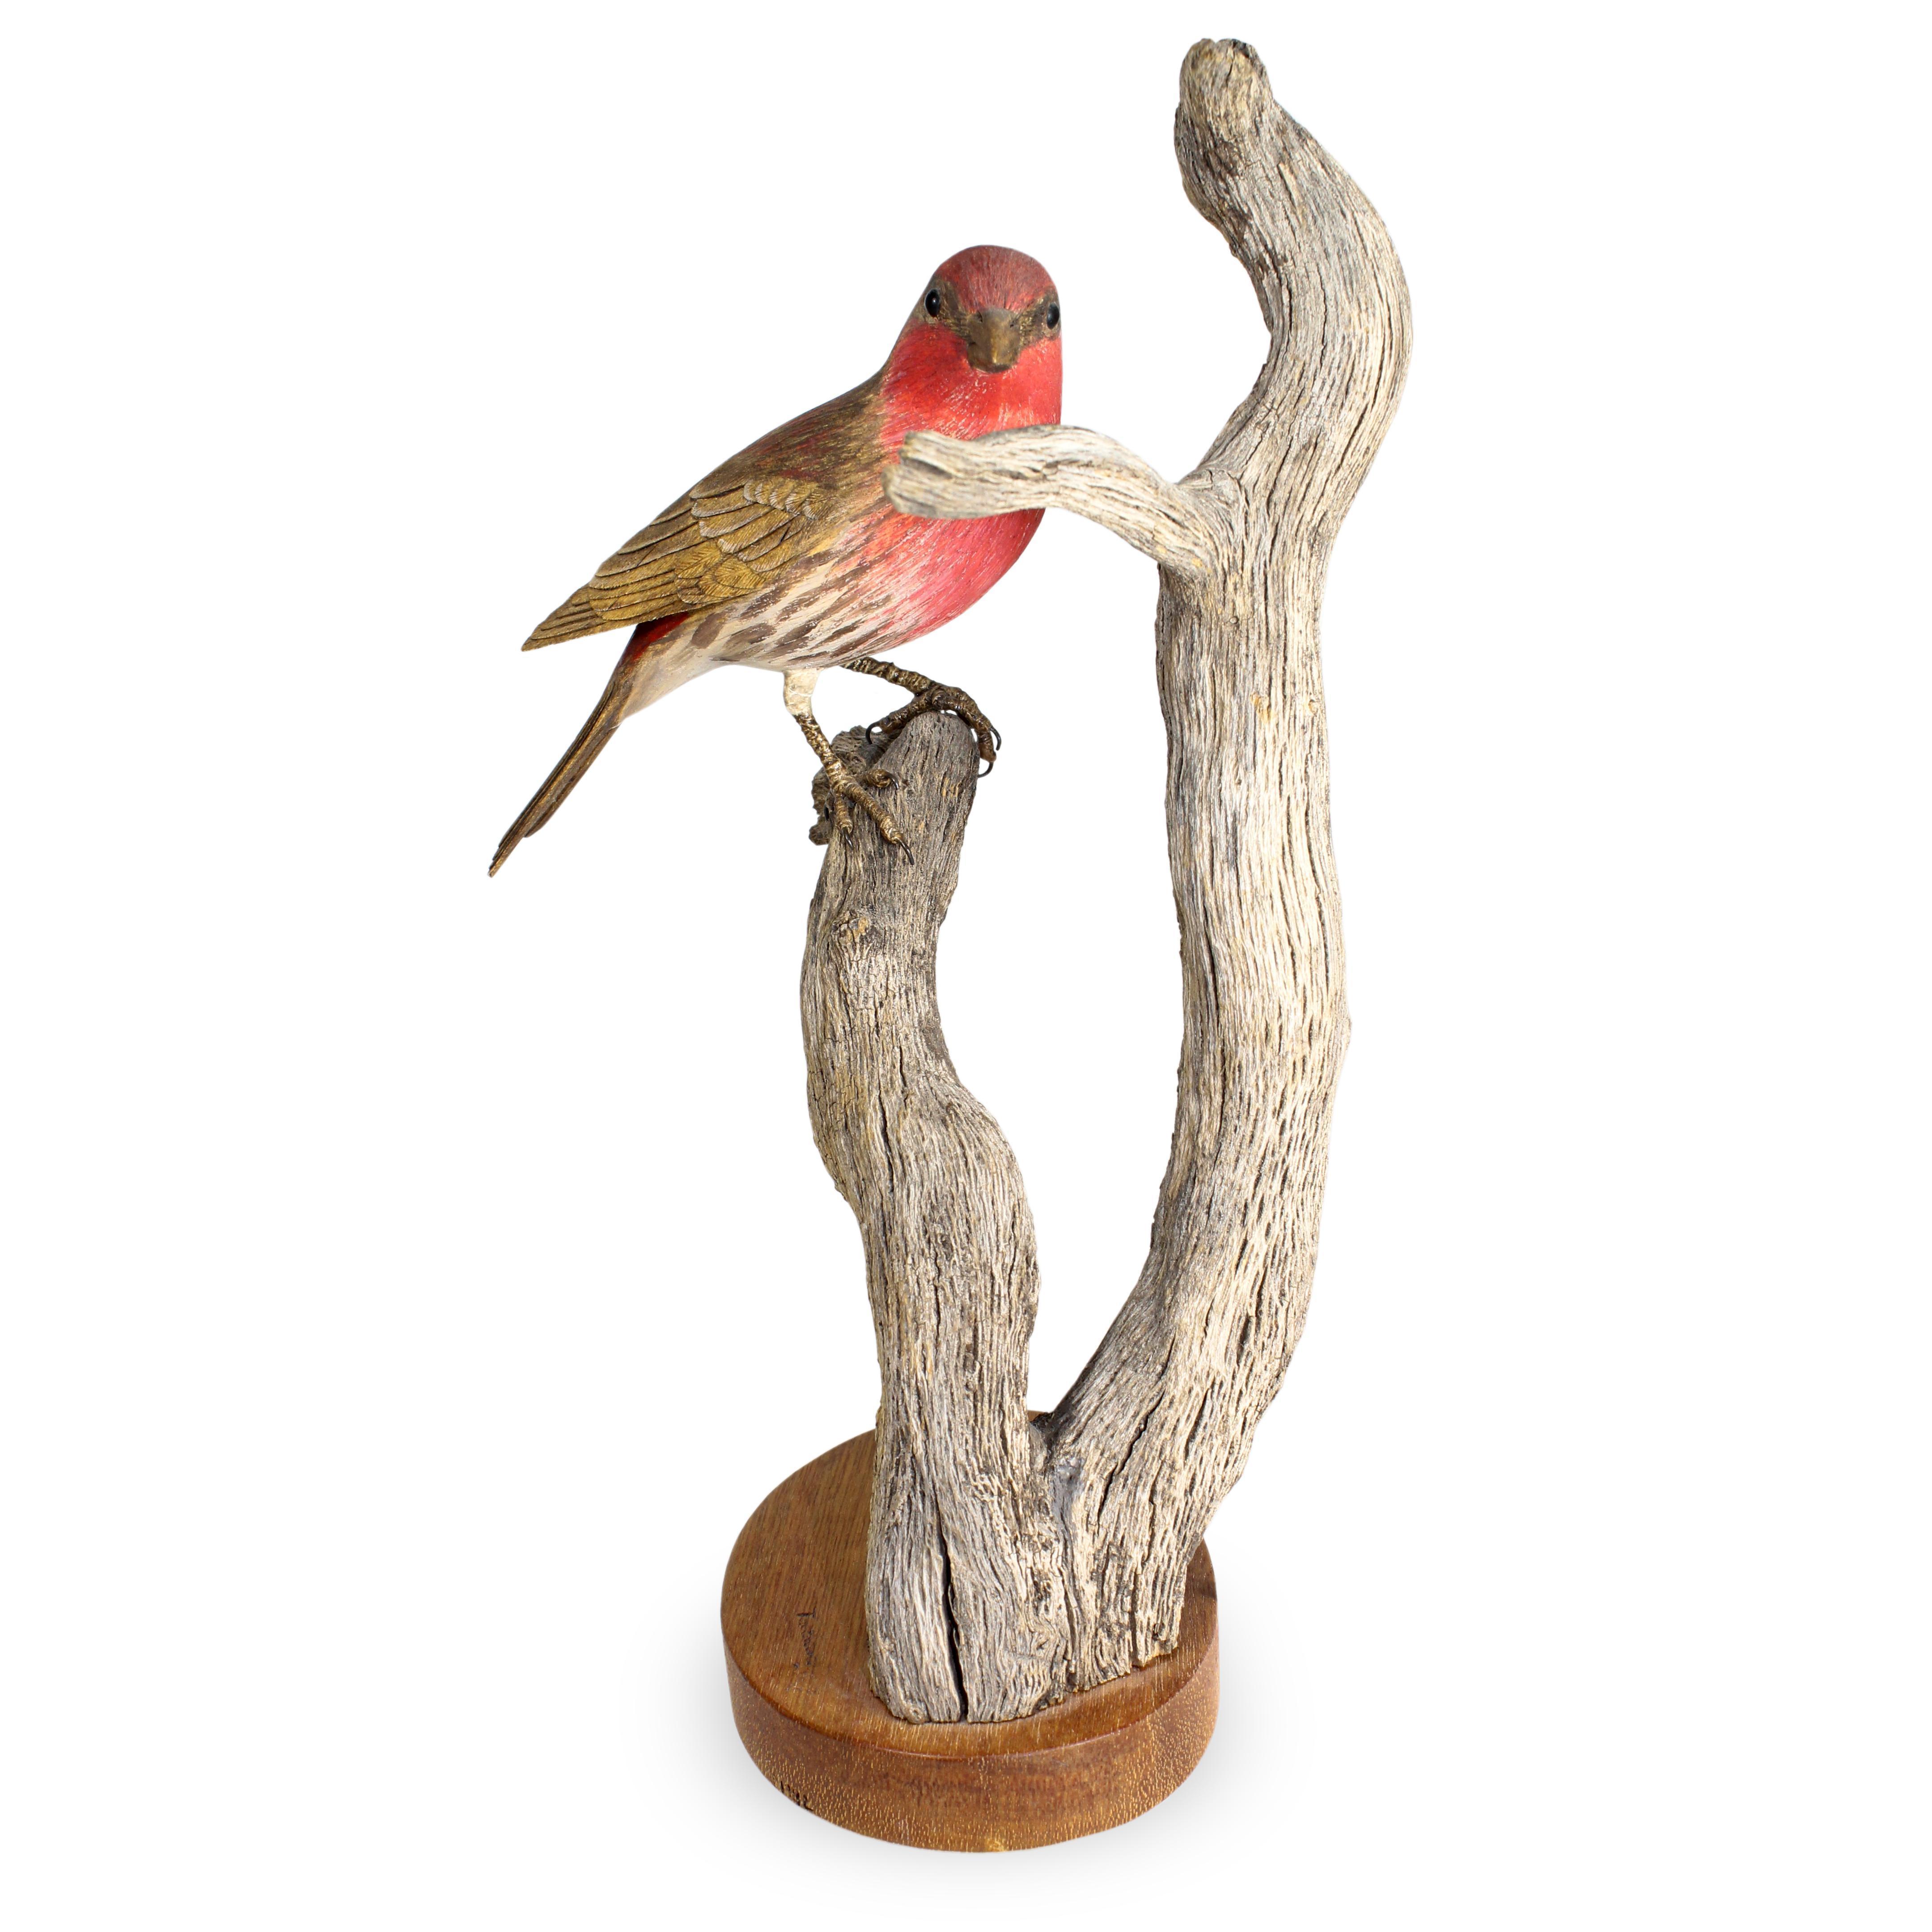 Trethewey Wooden Painted Red Bird On Branch